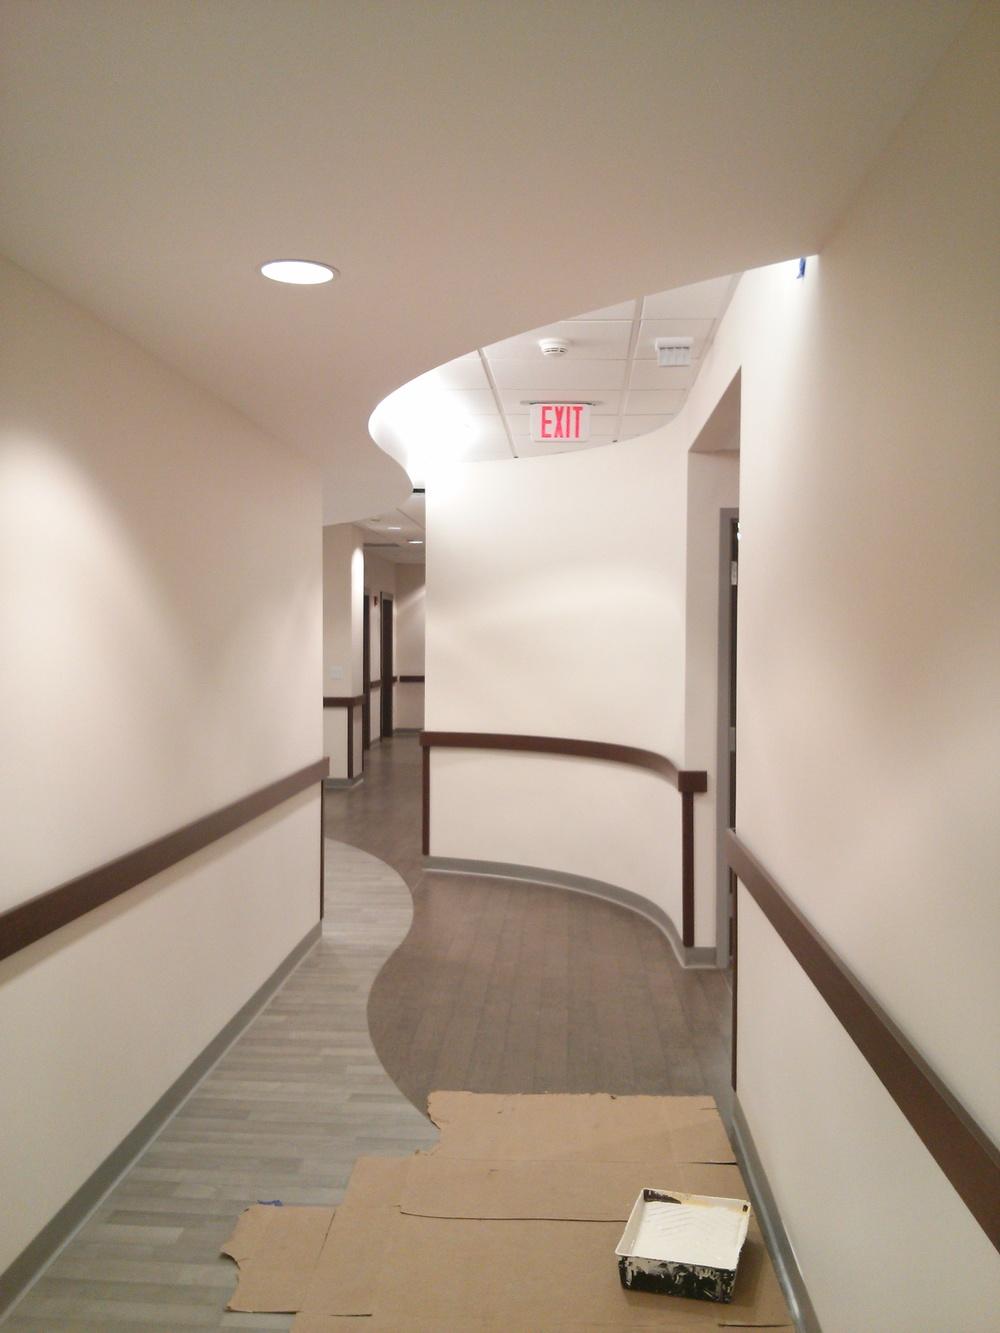 View down Corridor